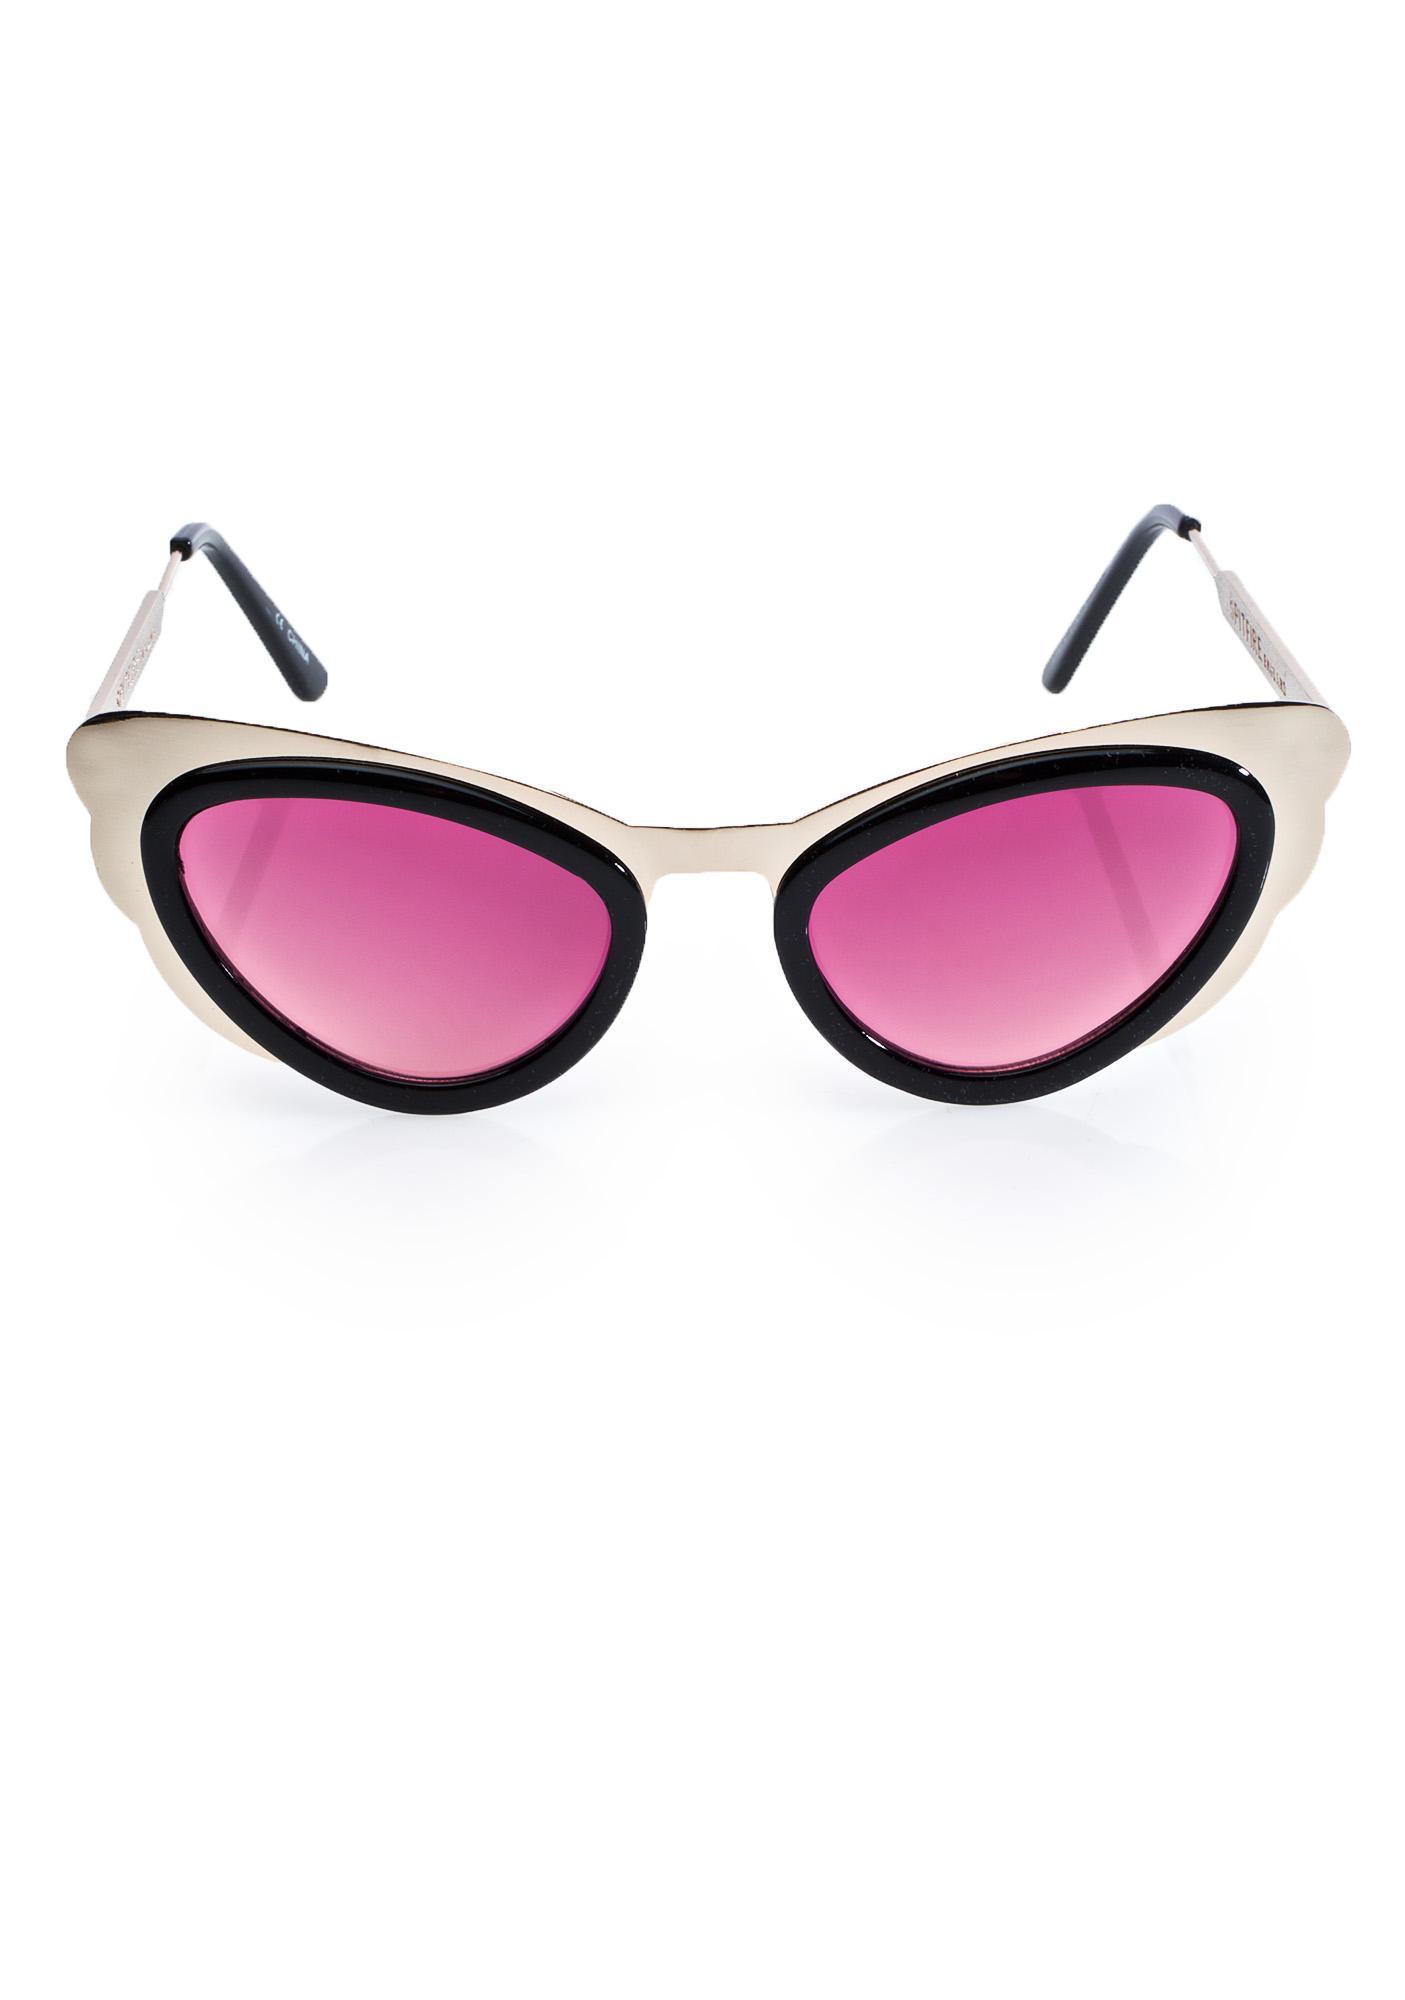 Spitfire Apex Sunglasses